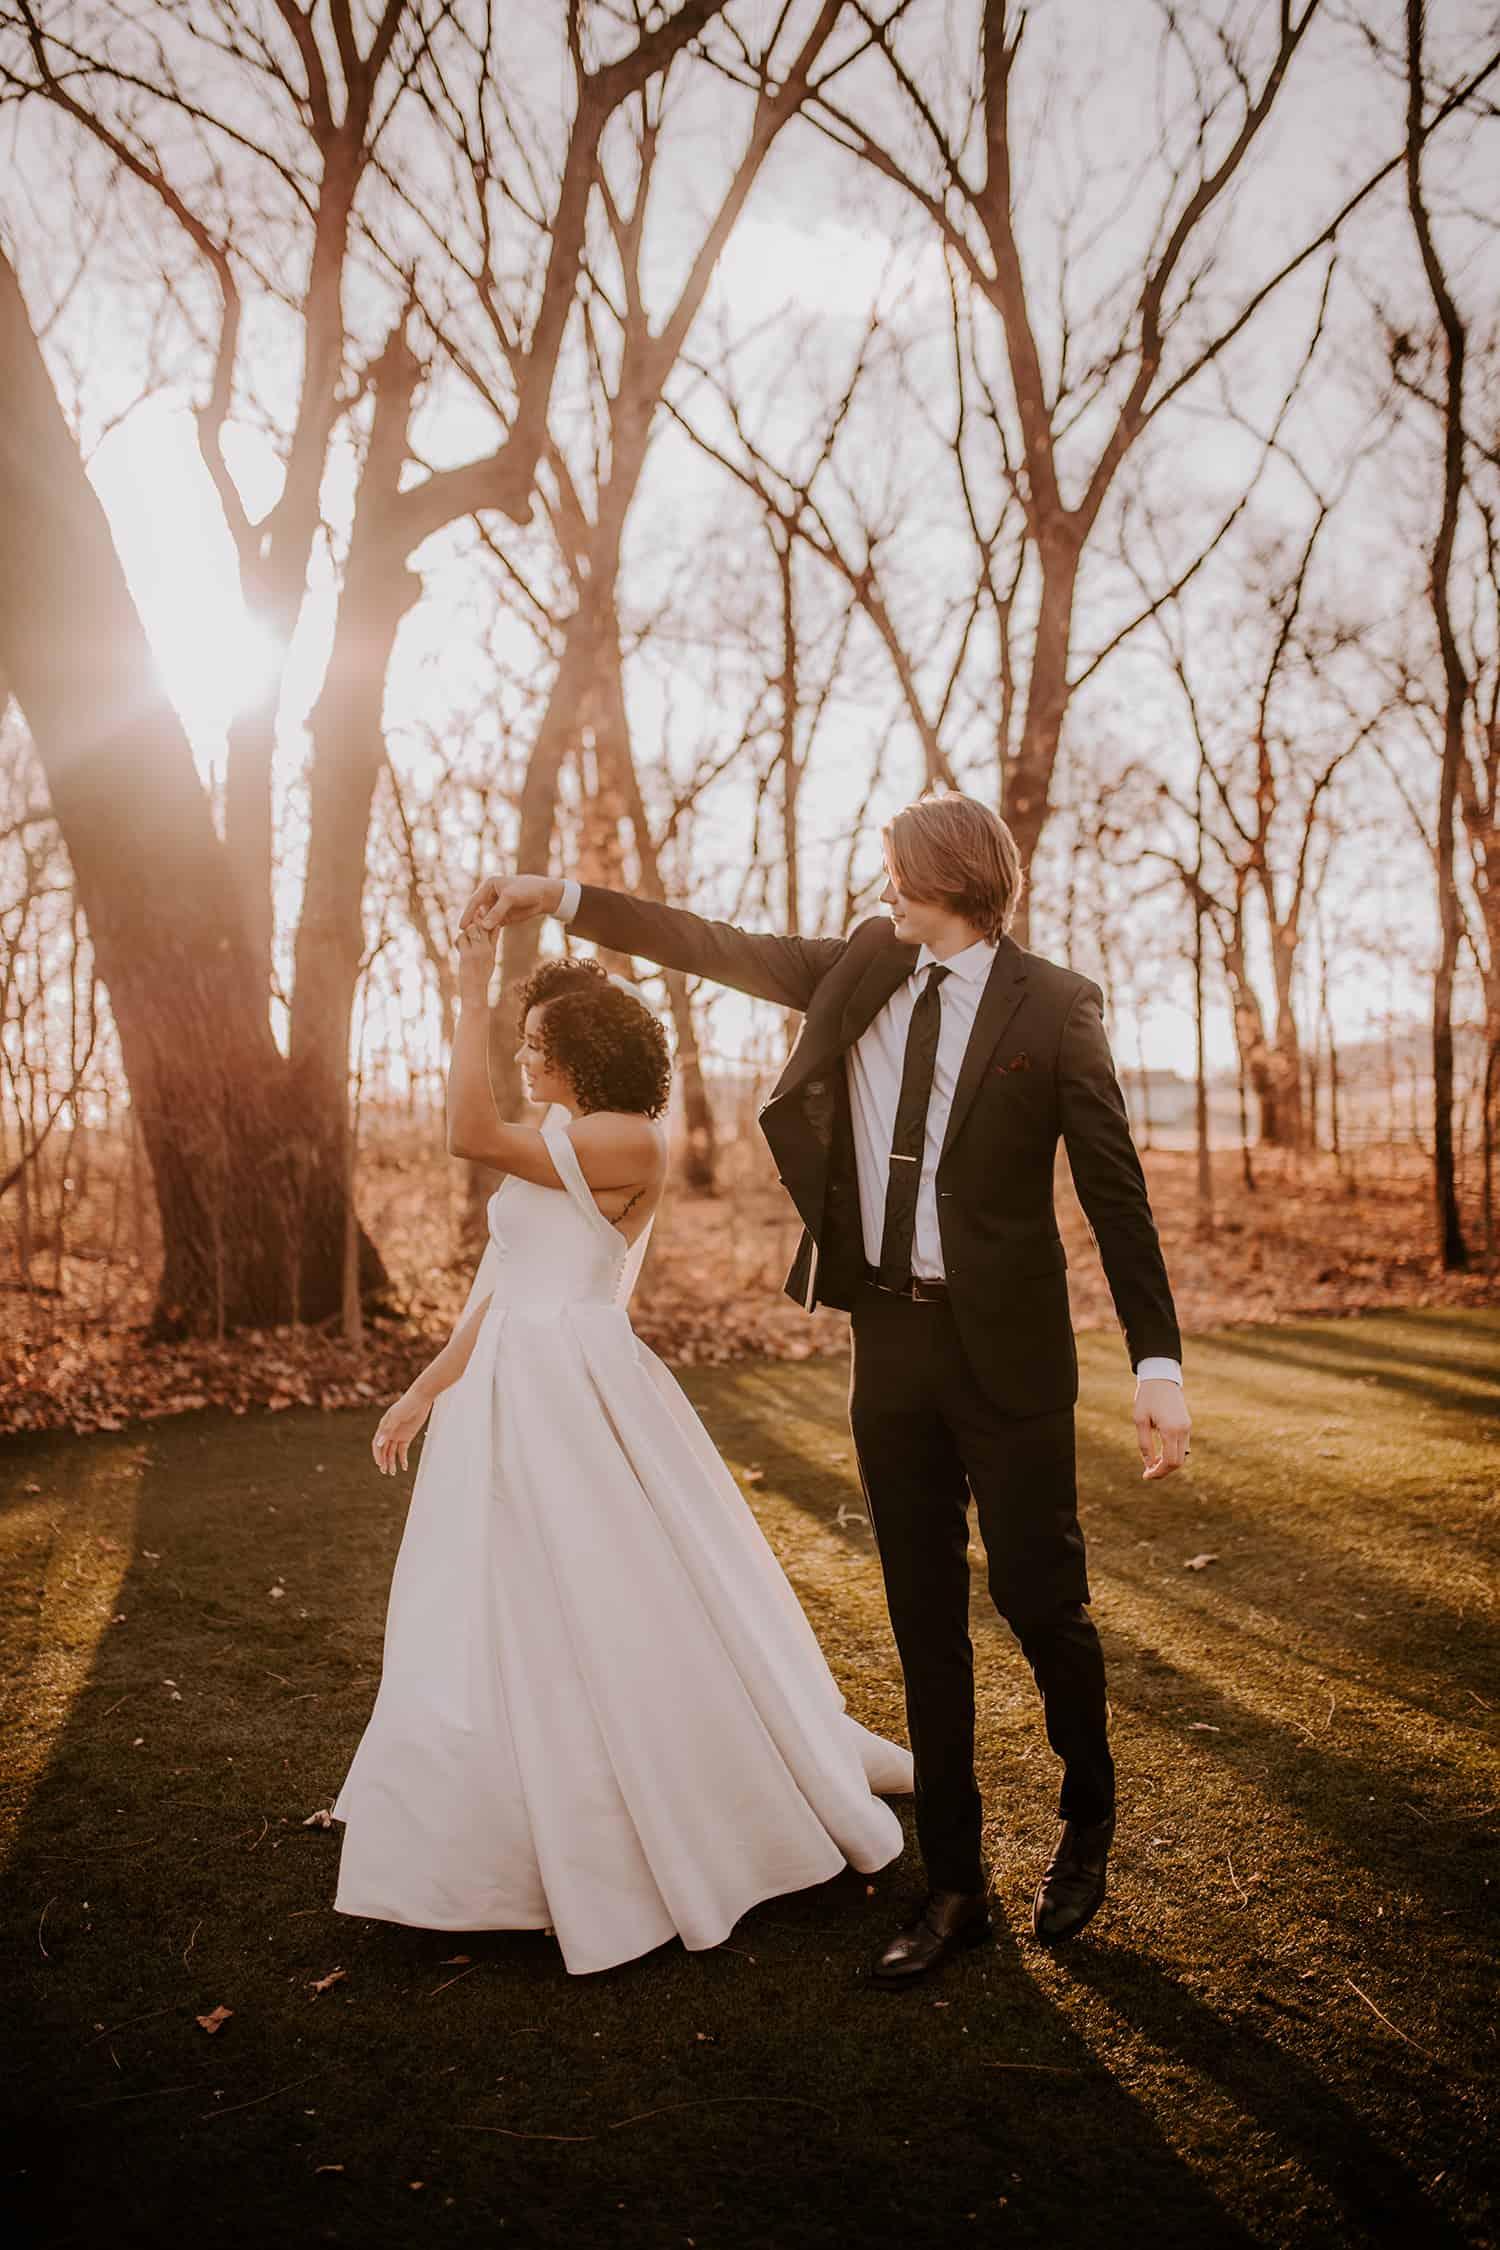 Twirl Your Bride